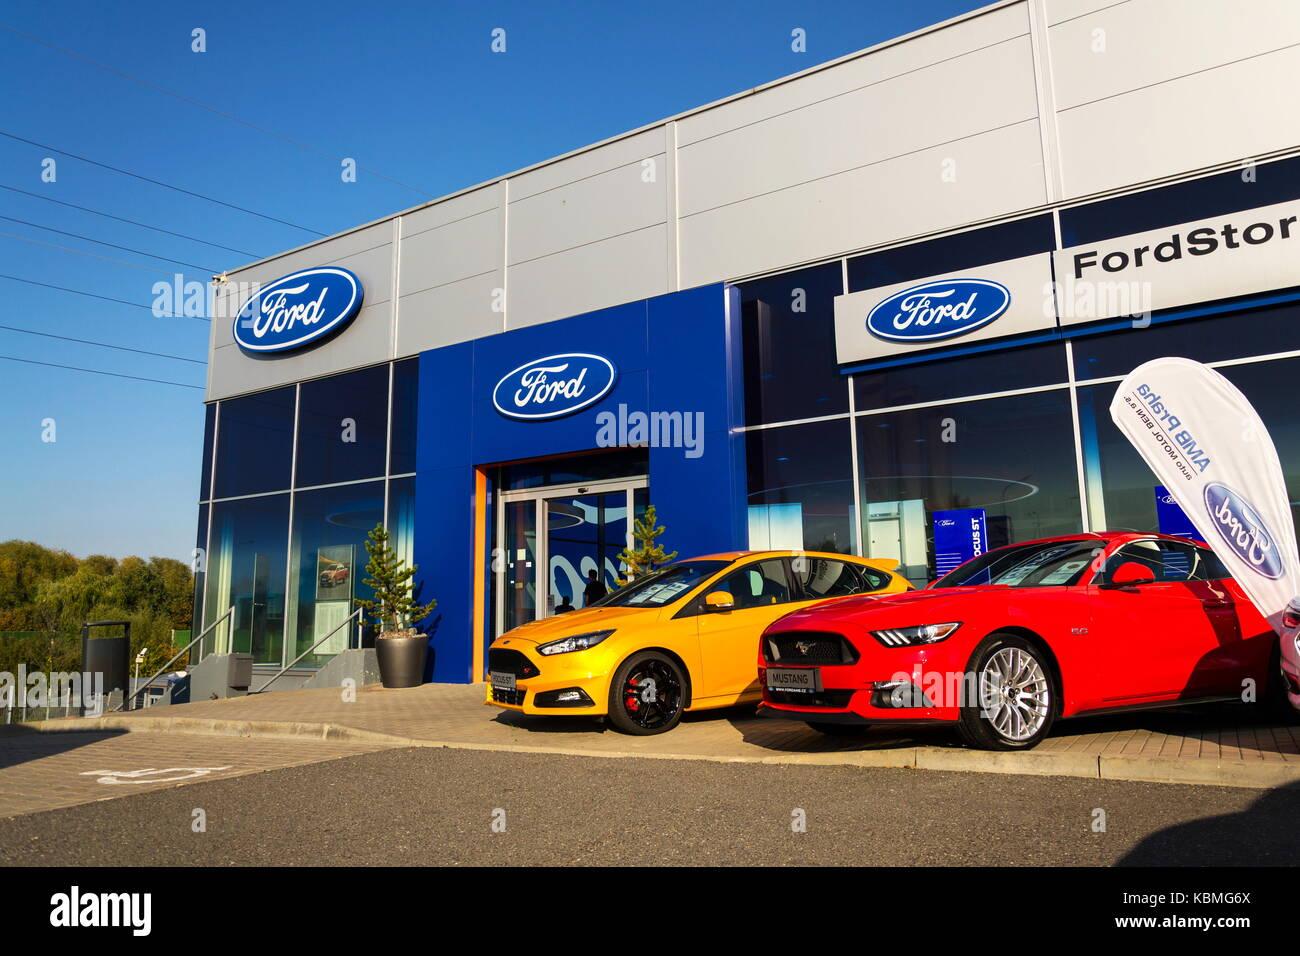 Prag, tschechische Republik - 29 September: Autos vor Ford Motor Company dealership Gebäude am 29. September Stockbild